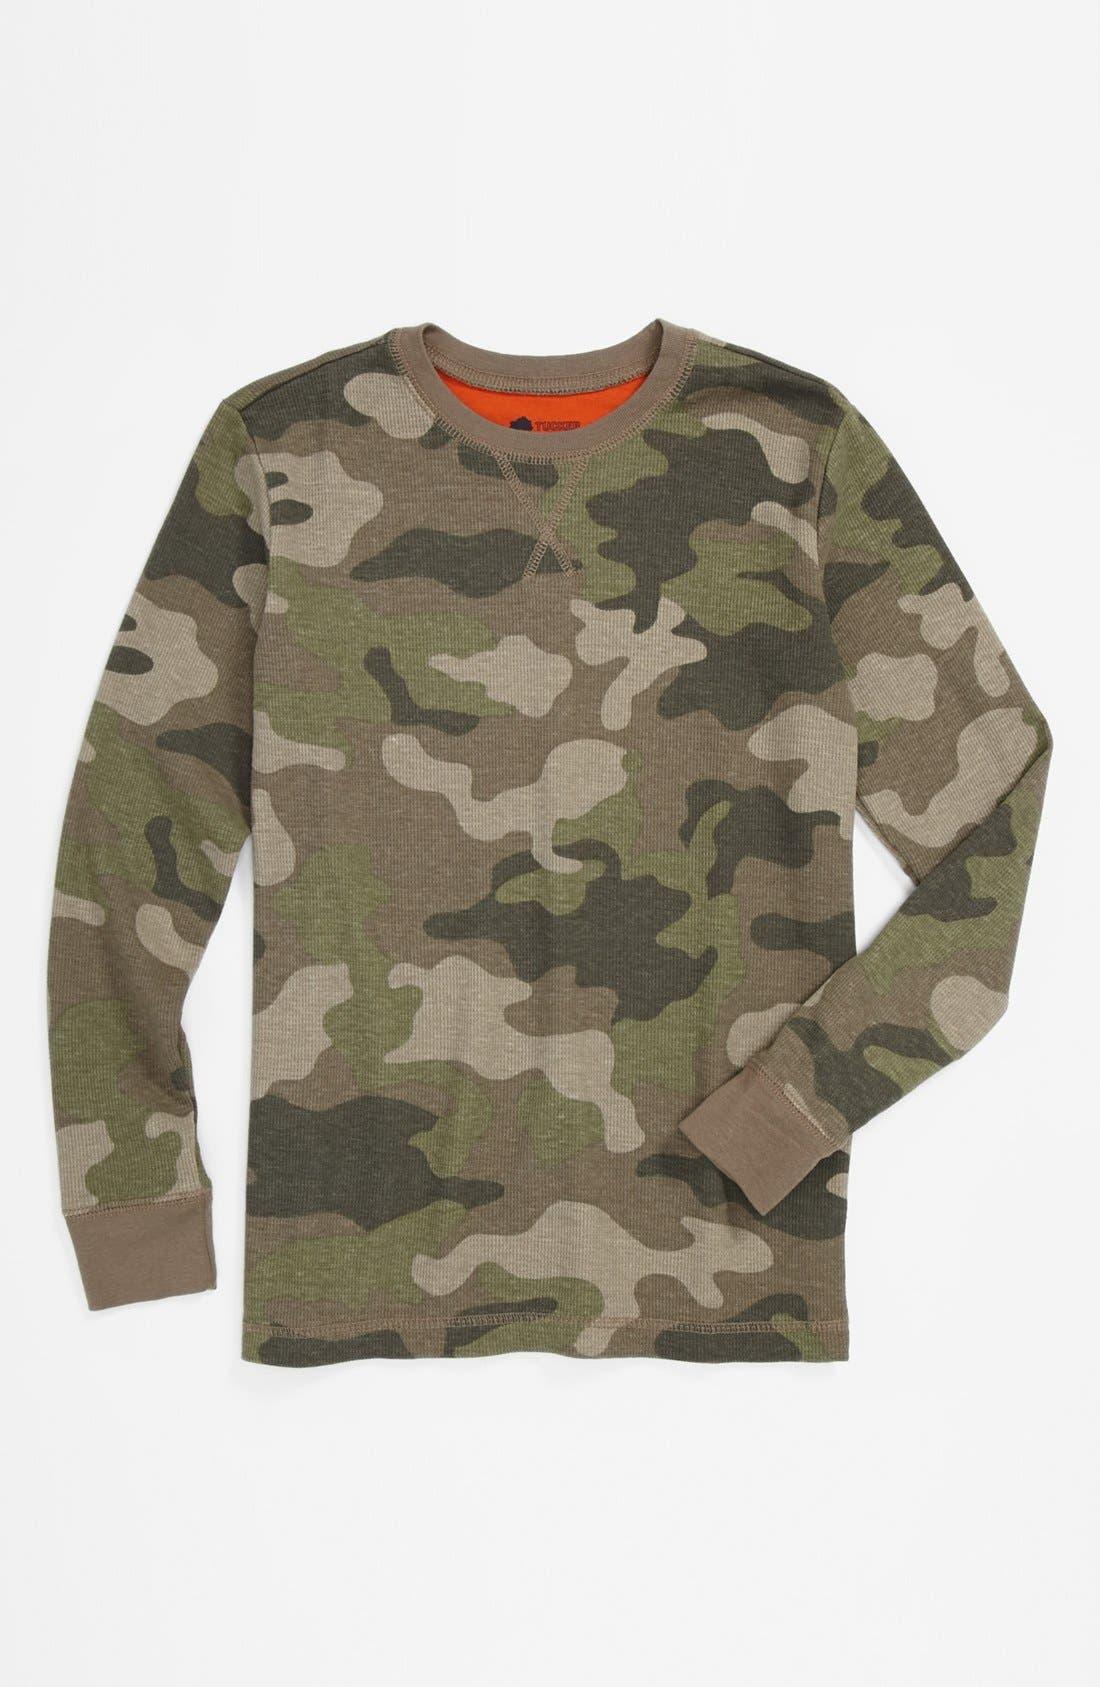 Alternate Image 1 Selected - Tucker + Tate 'Sultan' Long Sleeve Shirt (Little Boys)